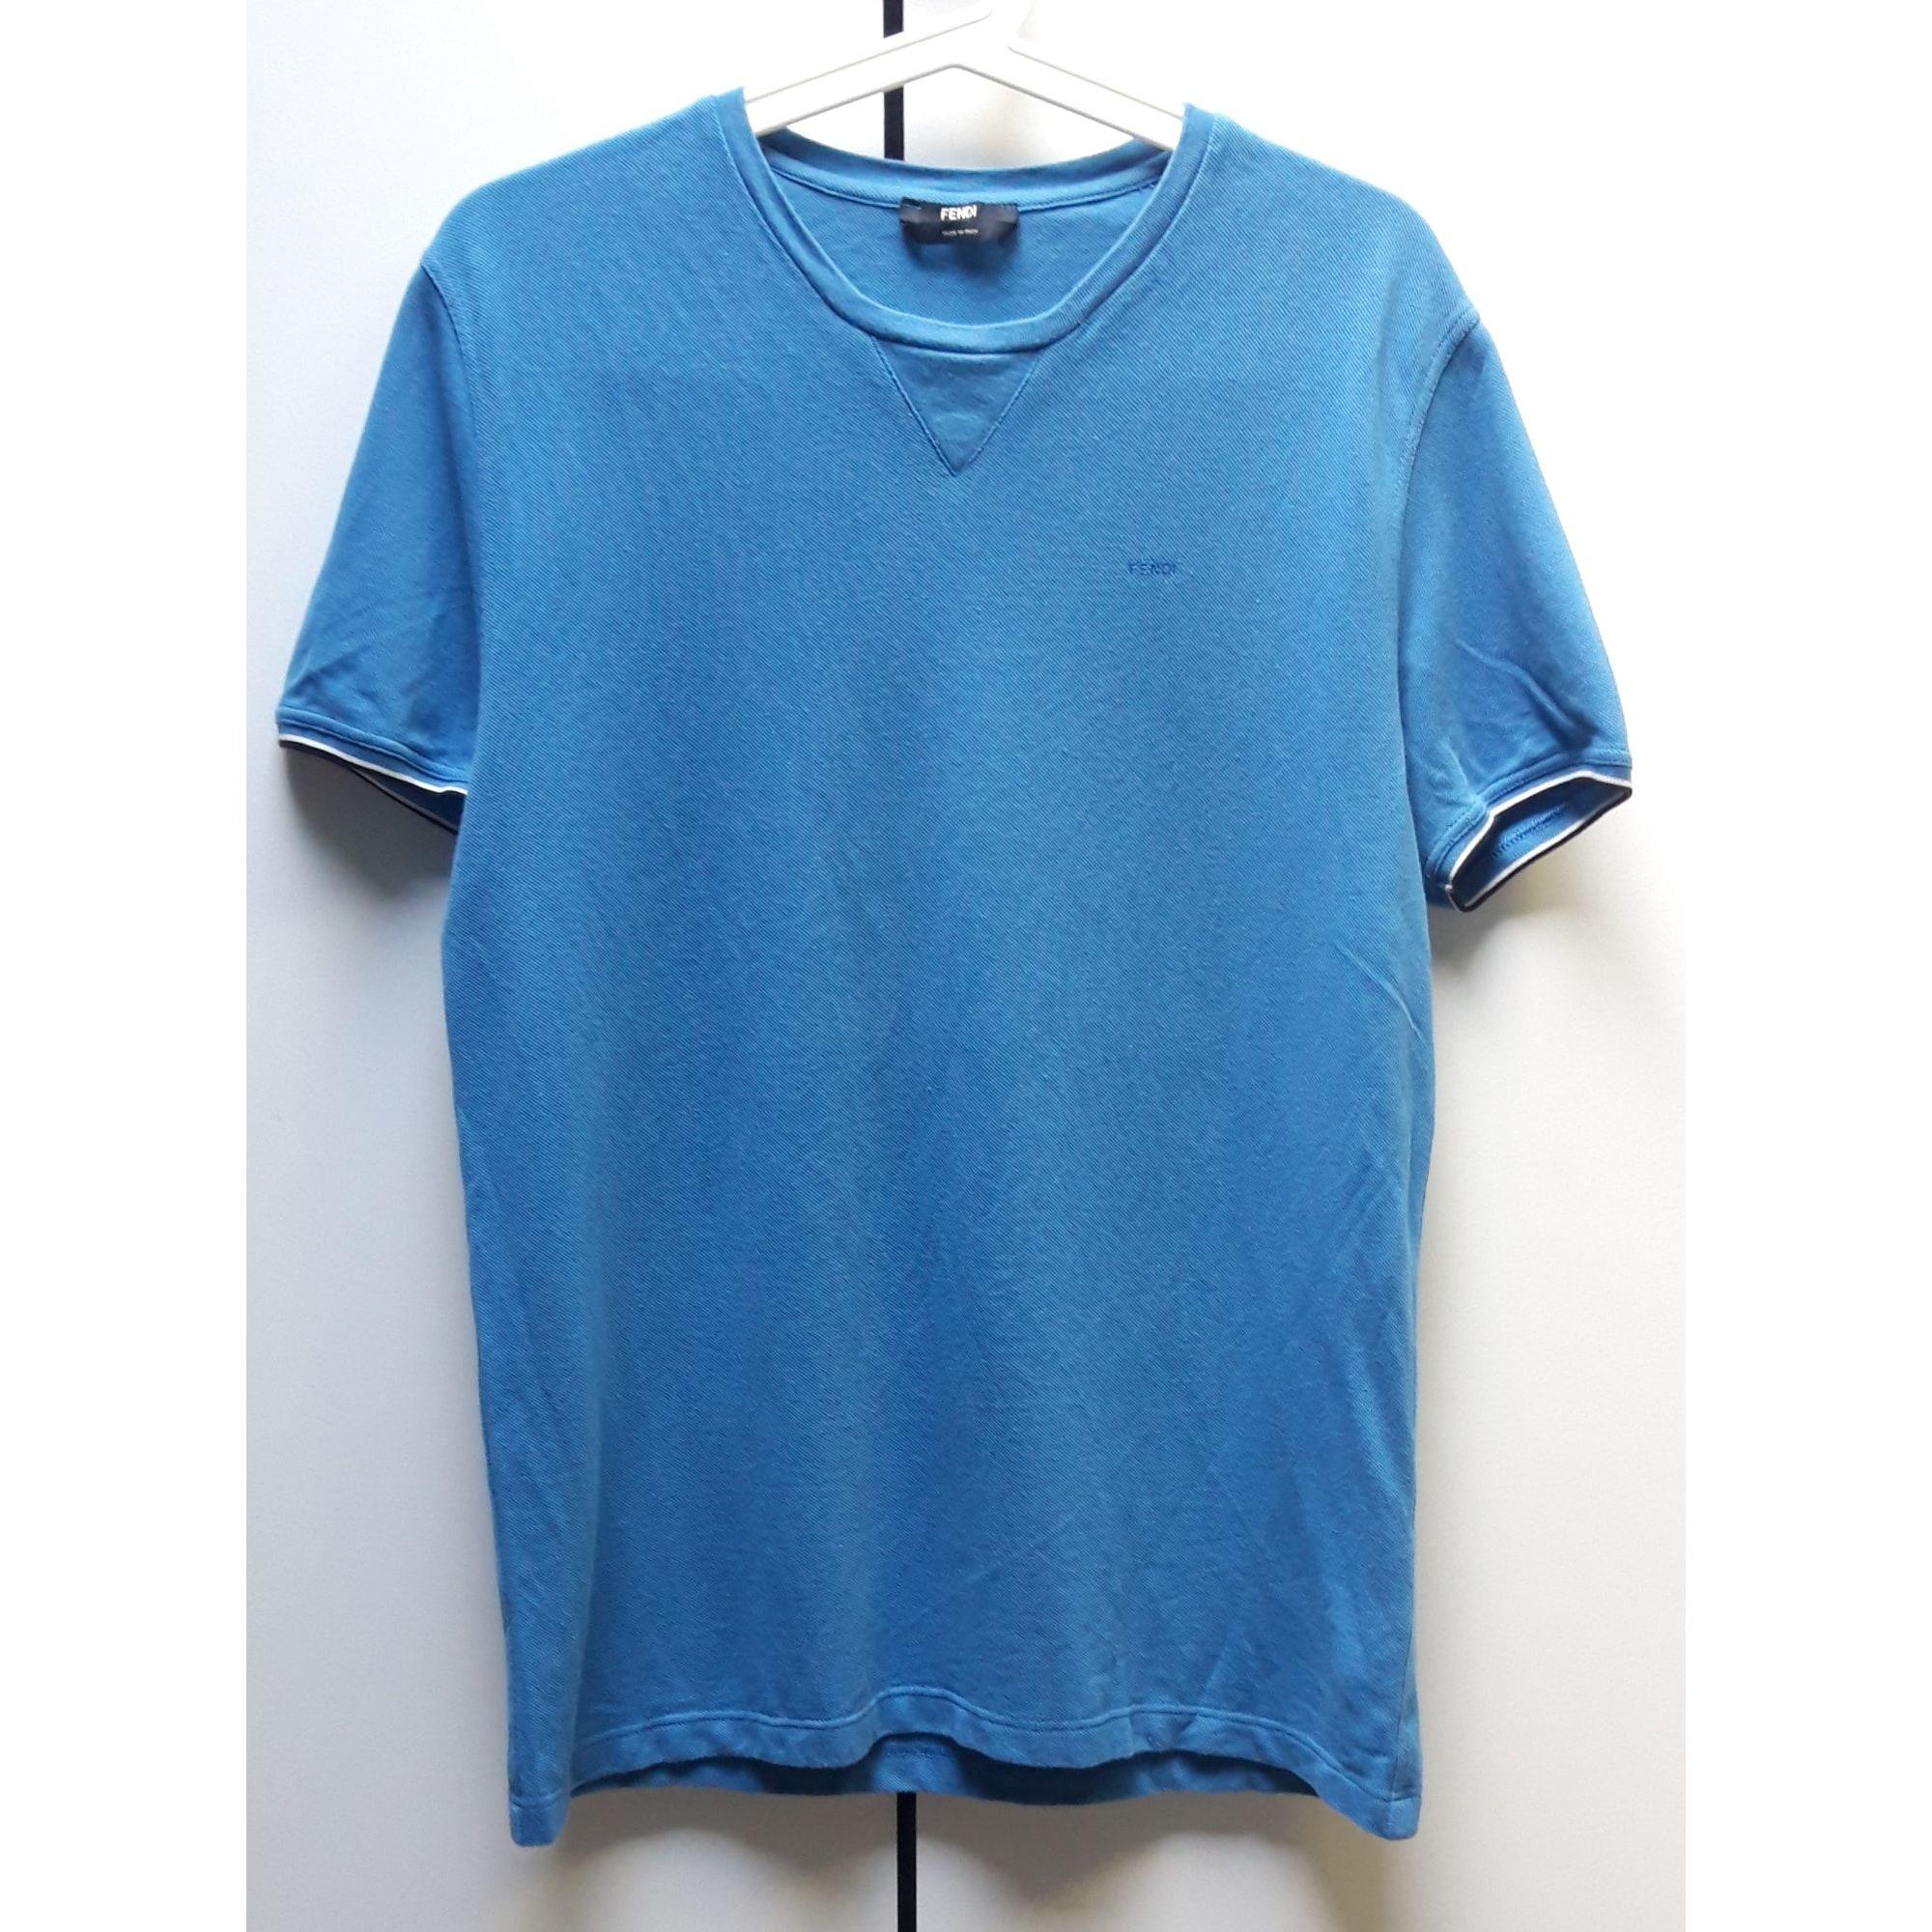 Tee-shirt FENDI Bleu, bleu marine, bleu turquoise